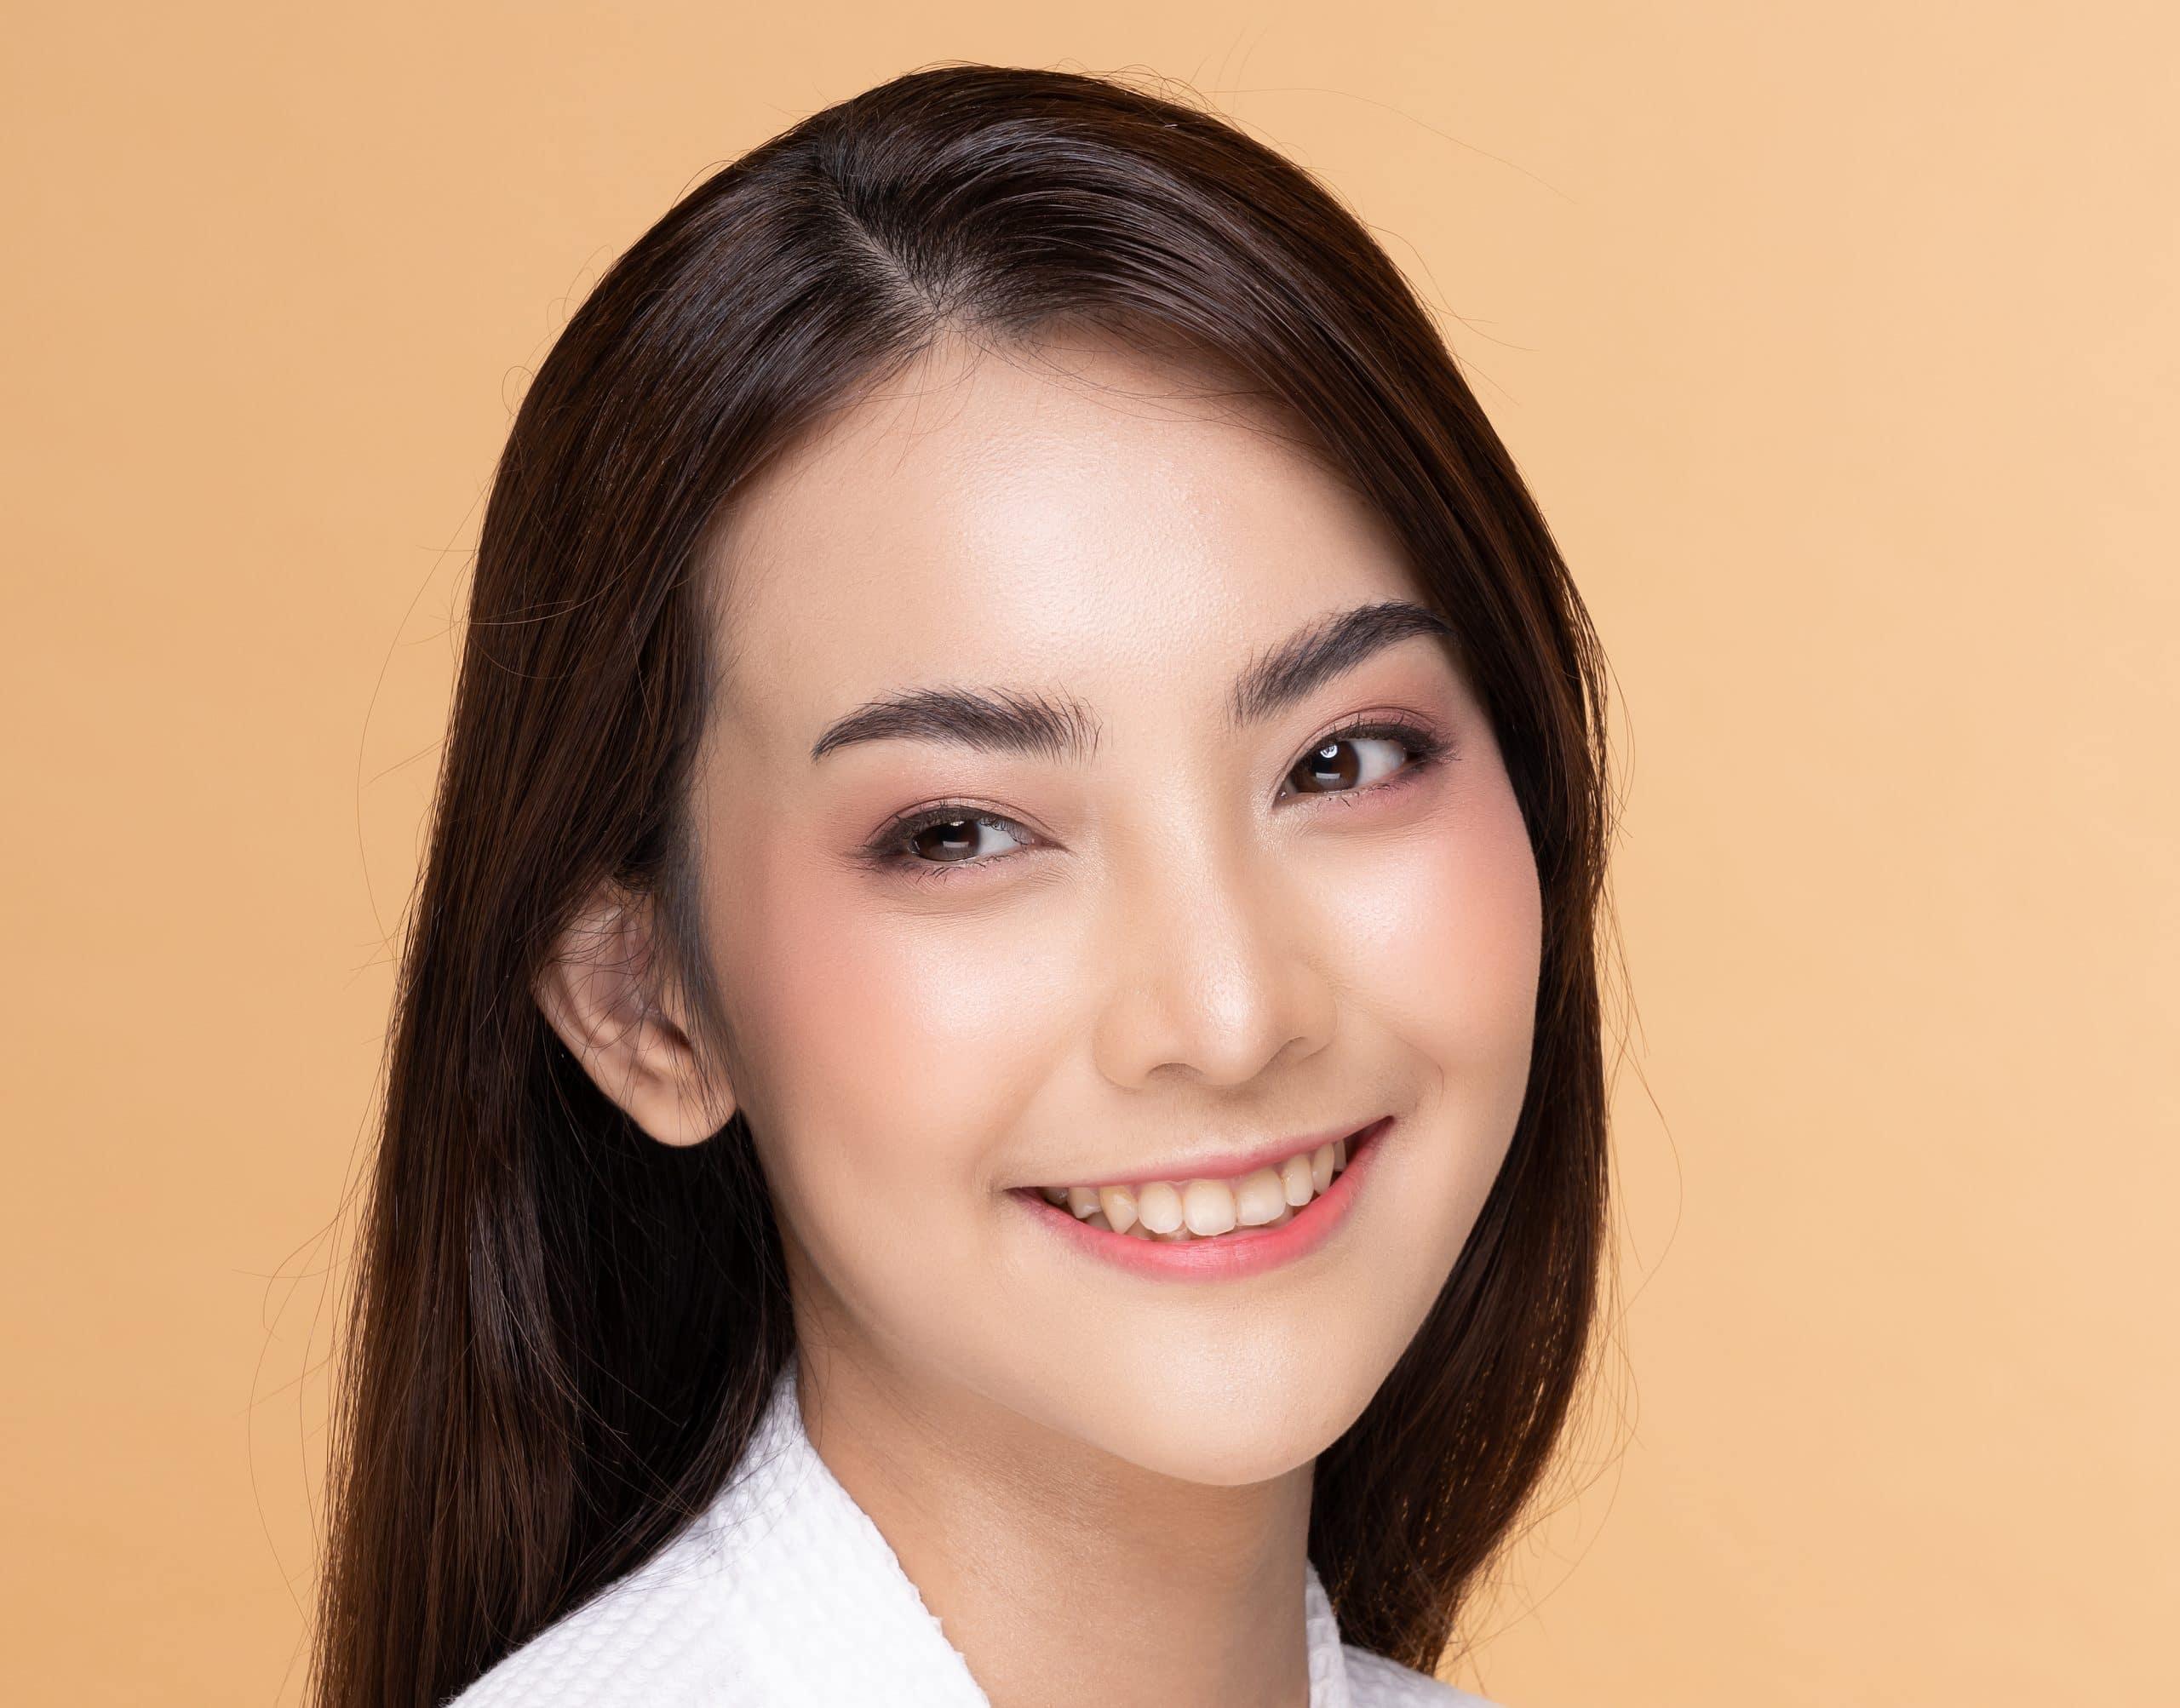 Hotel Room Massage-Asian Massage Therapist-Outcall Asian Massage-Best Massage In Las Vegas